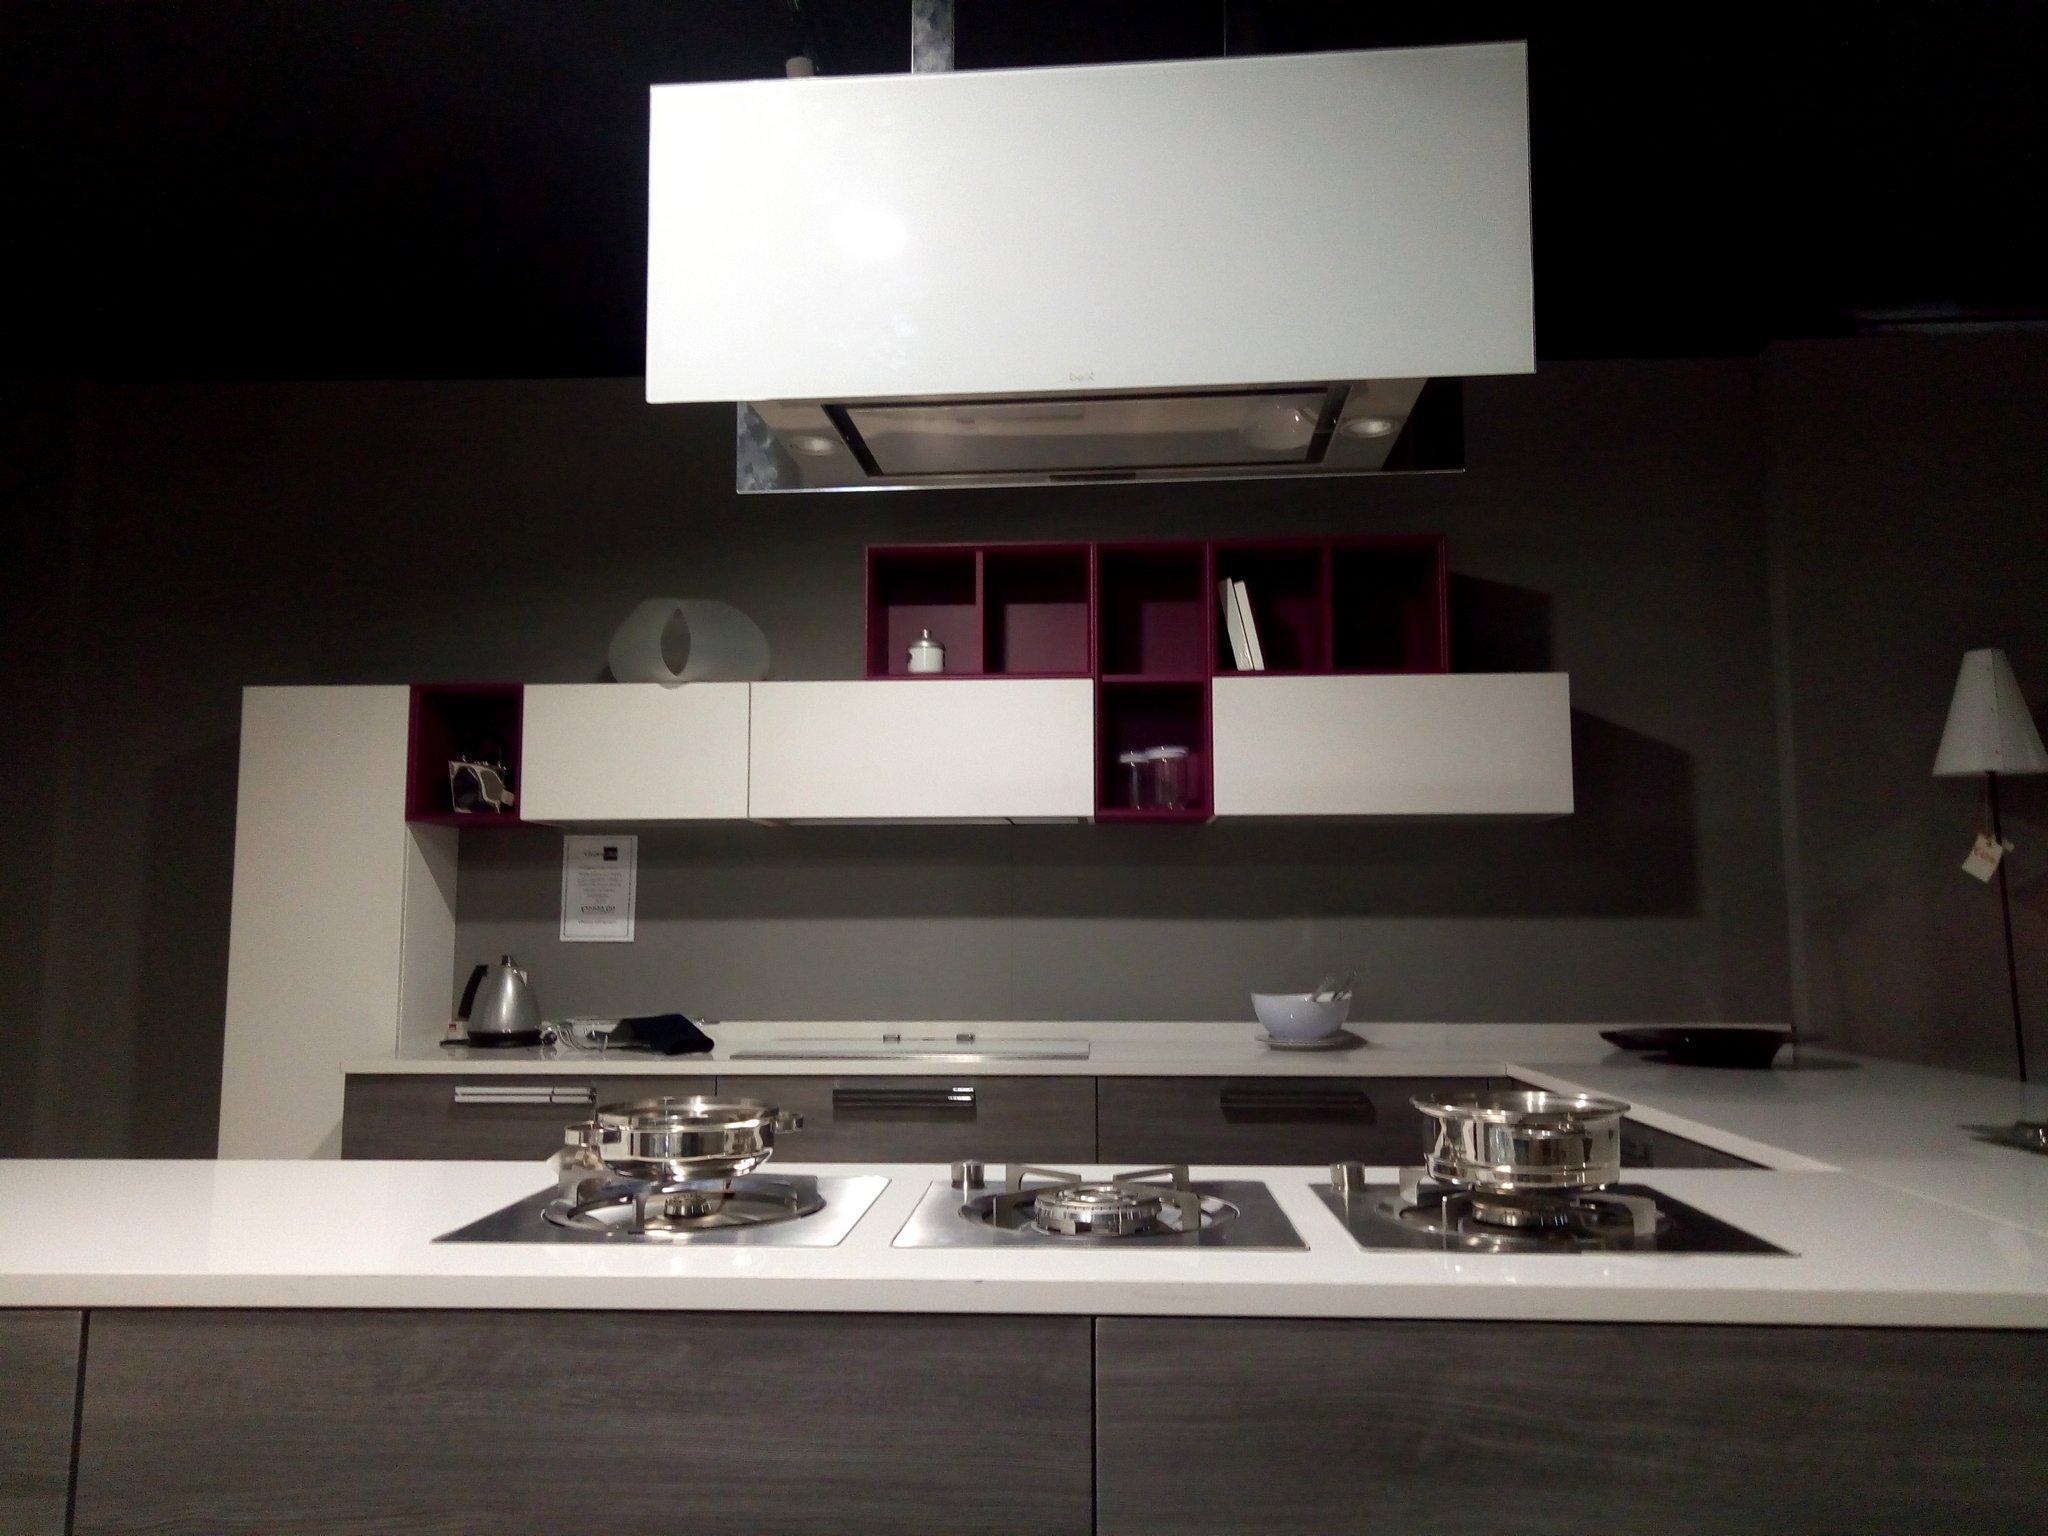 Cucina Lube Nilde Polimerico - Vissani Casa